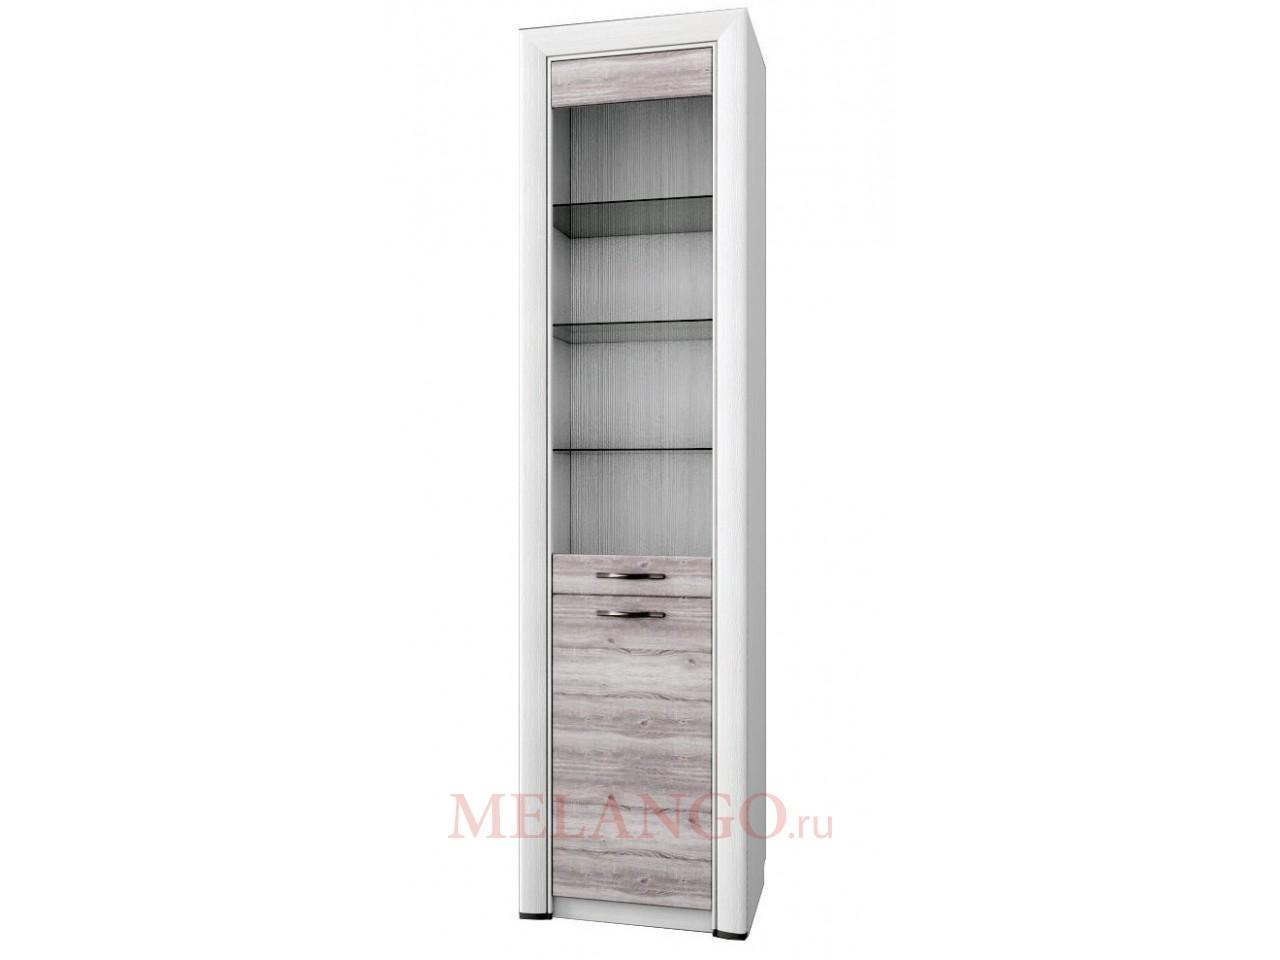 Шкаф-витрина для посуды Оливия 1V1D Распродажа!